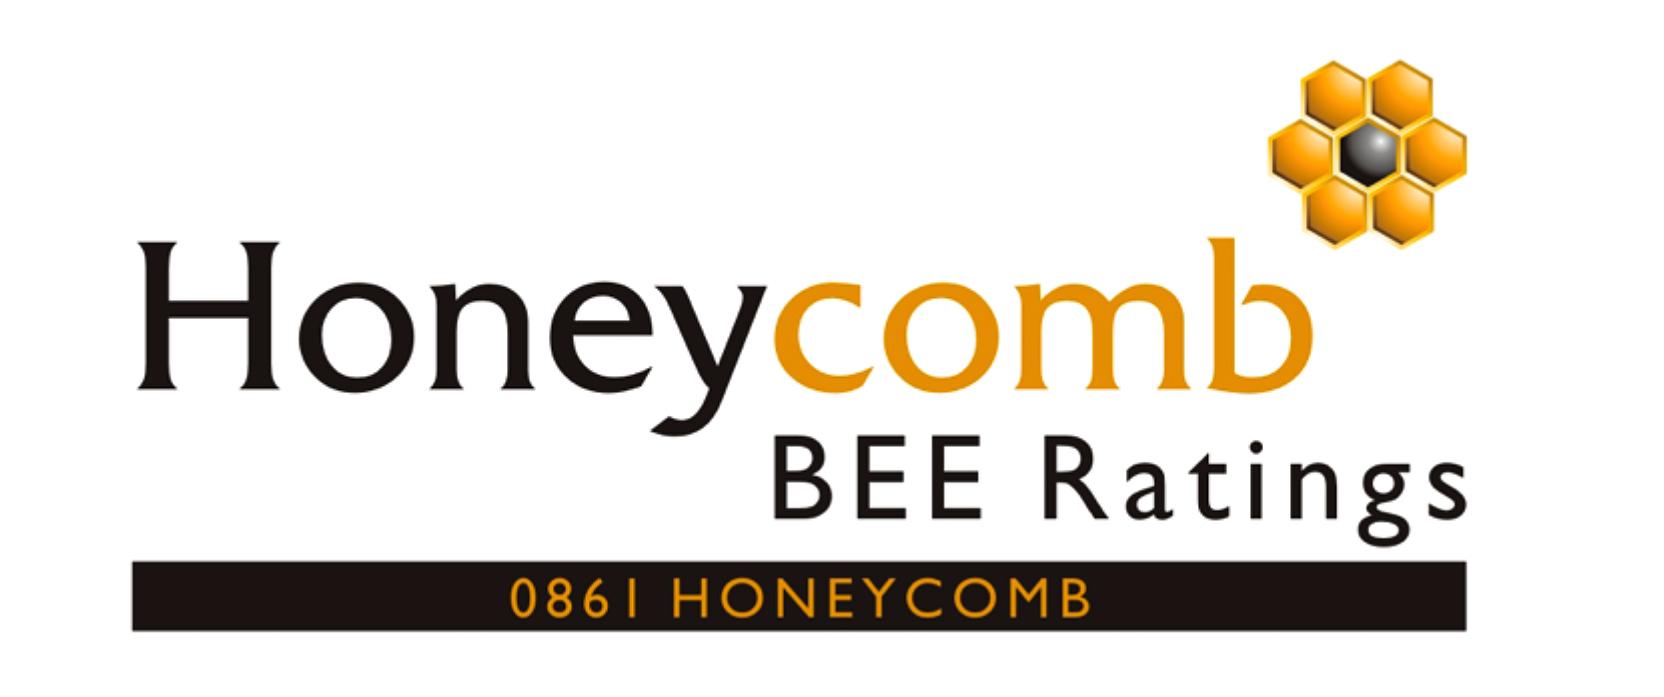 Honeycomb BEE Ratings